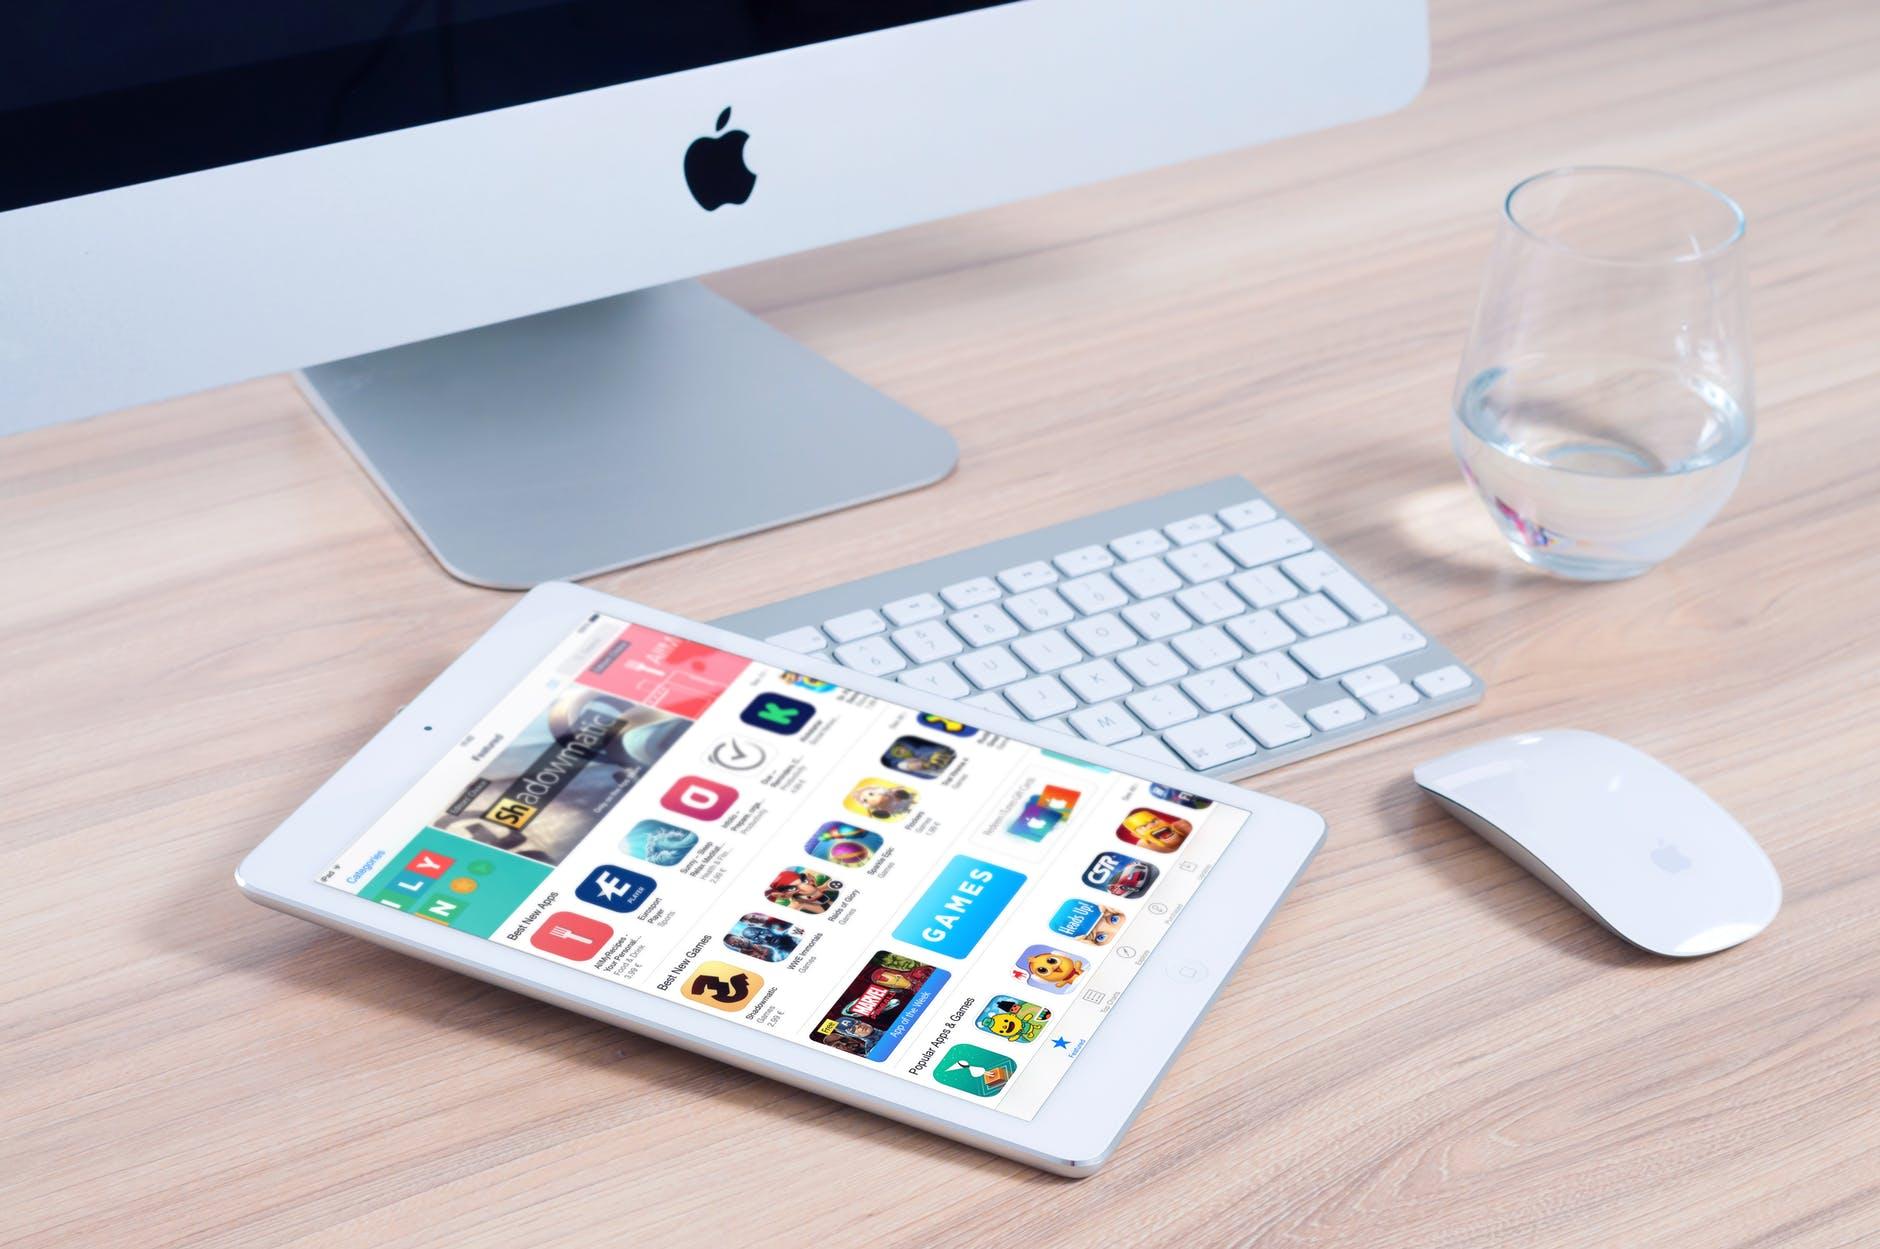 mac book and an ipad